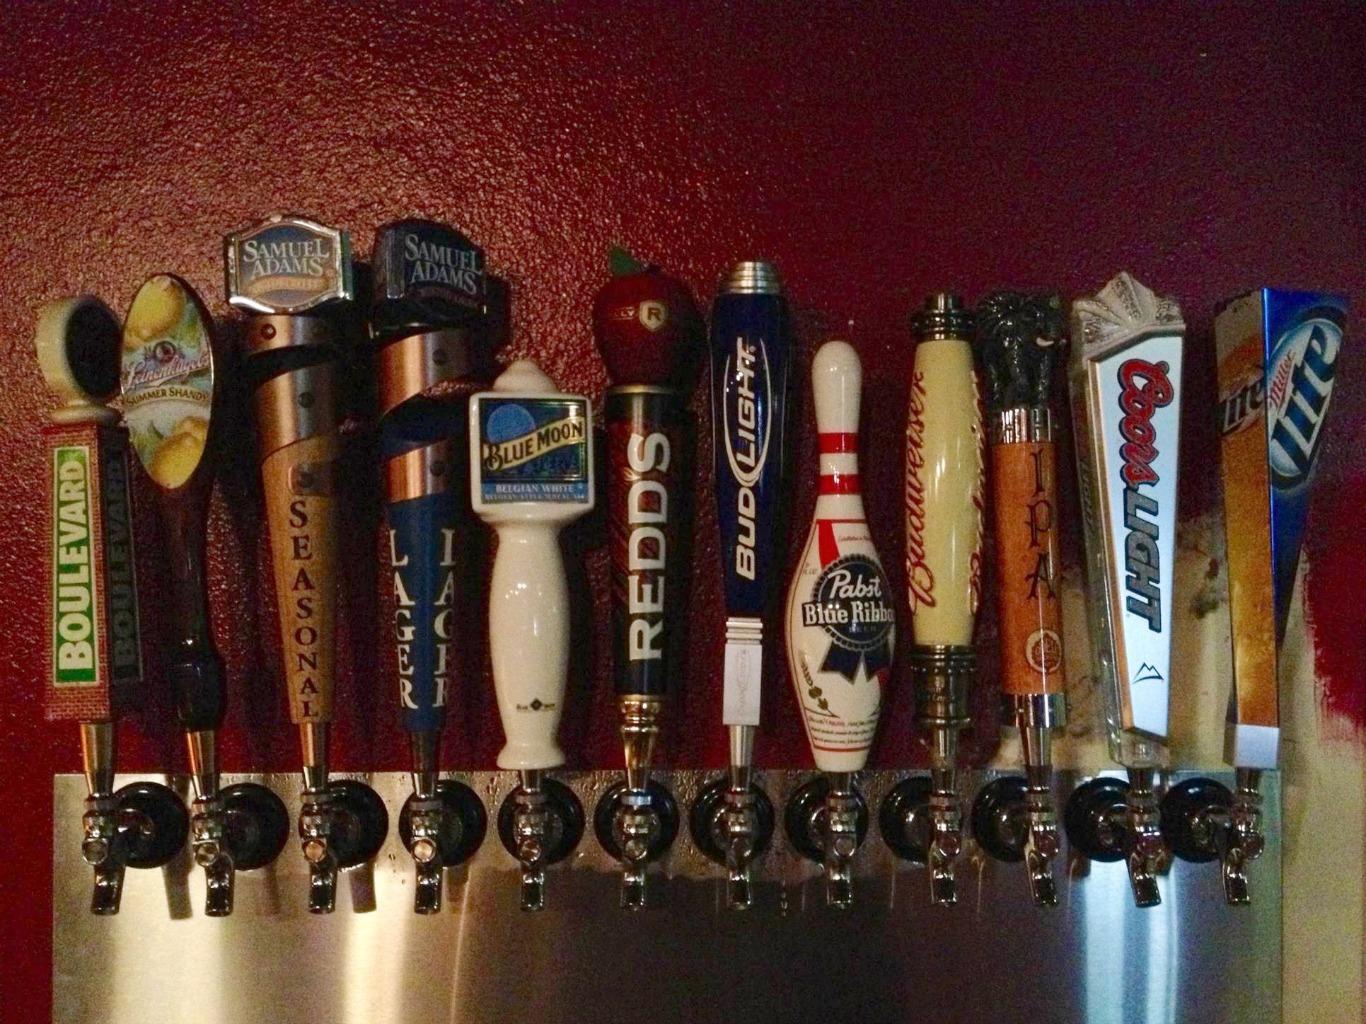 Sport_Bowl_beer_taps